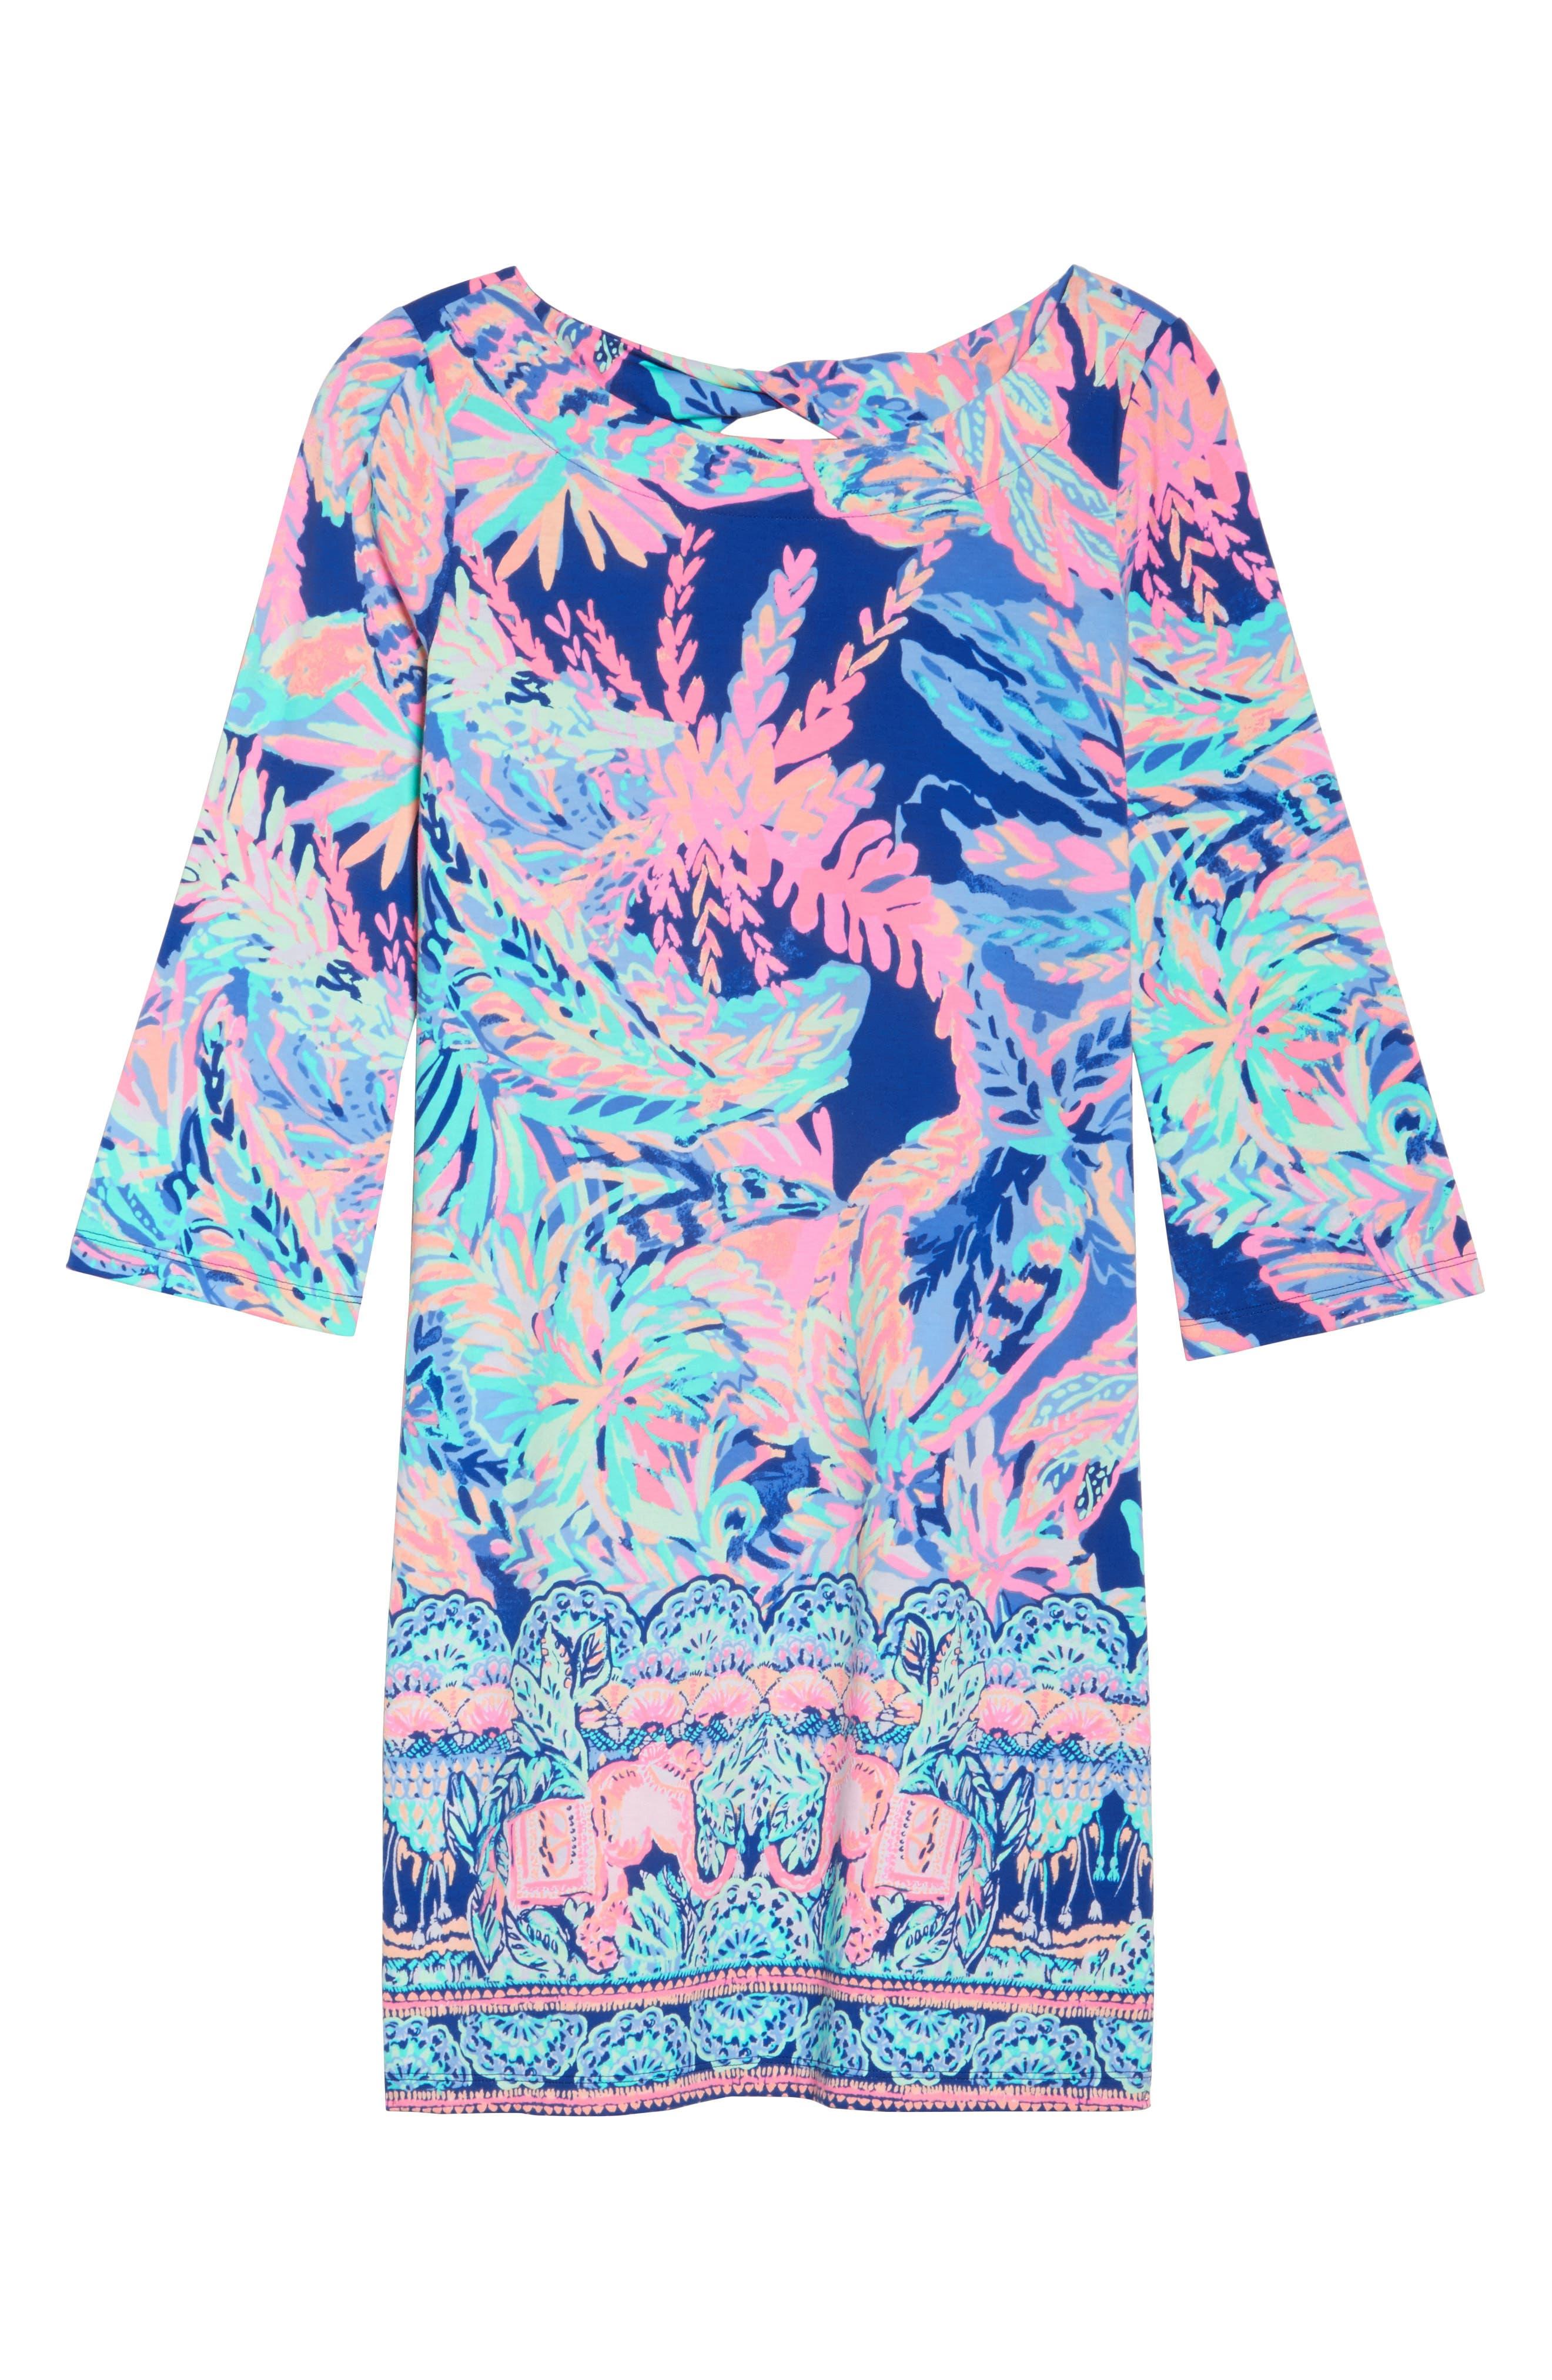 Bay Shift Dress,                             Alternate thumbnail 6, color,                             Multi Sunset Safari Engineered